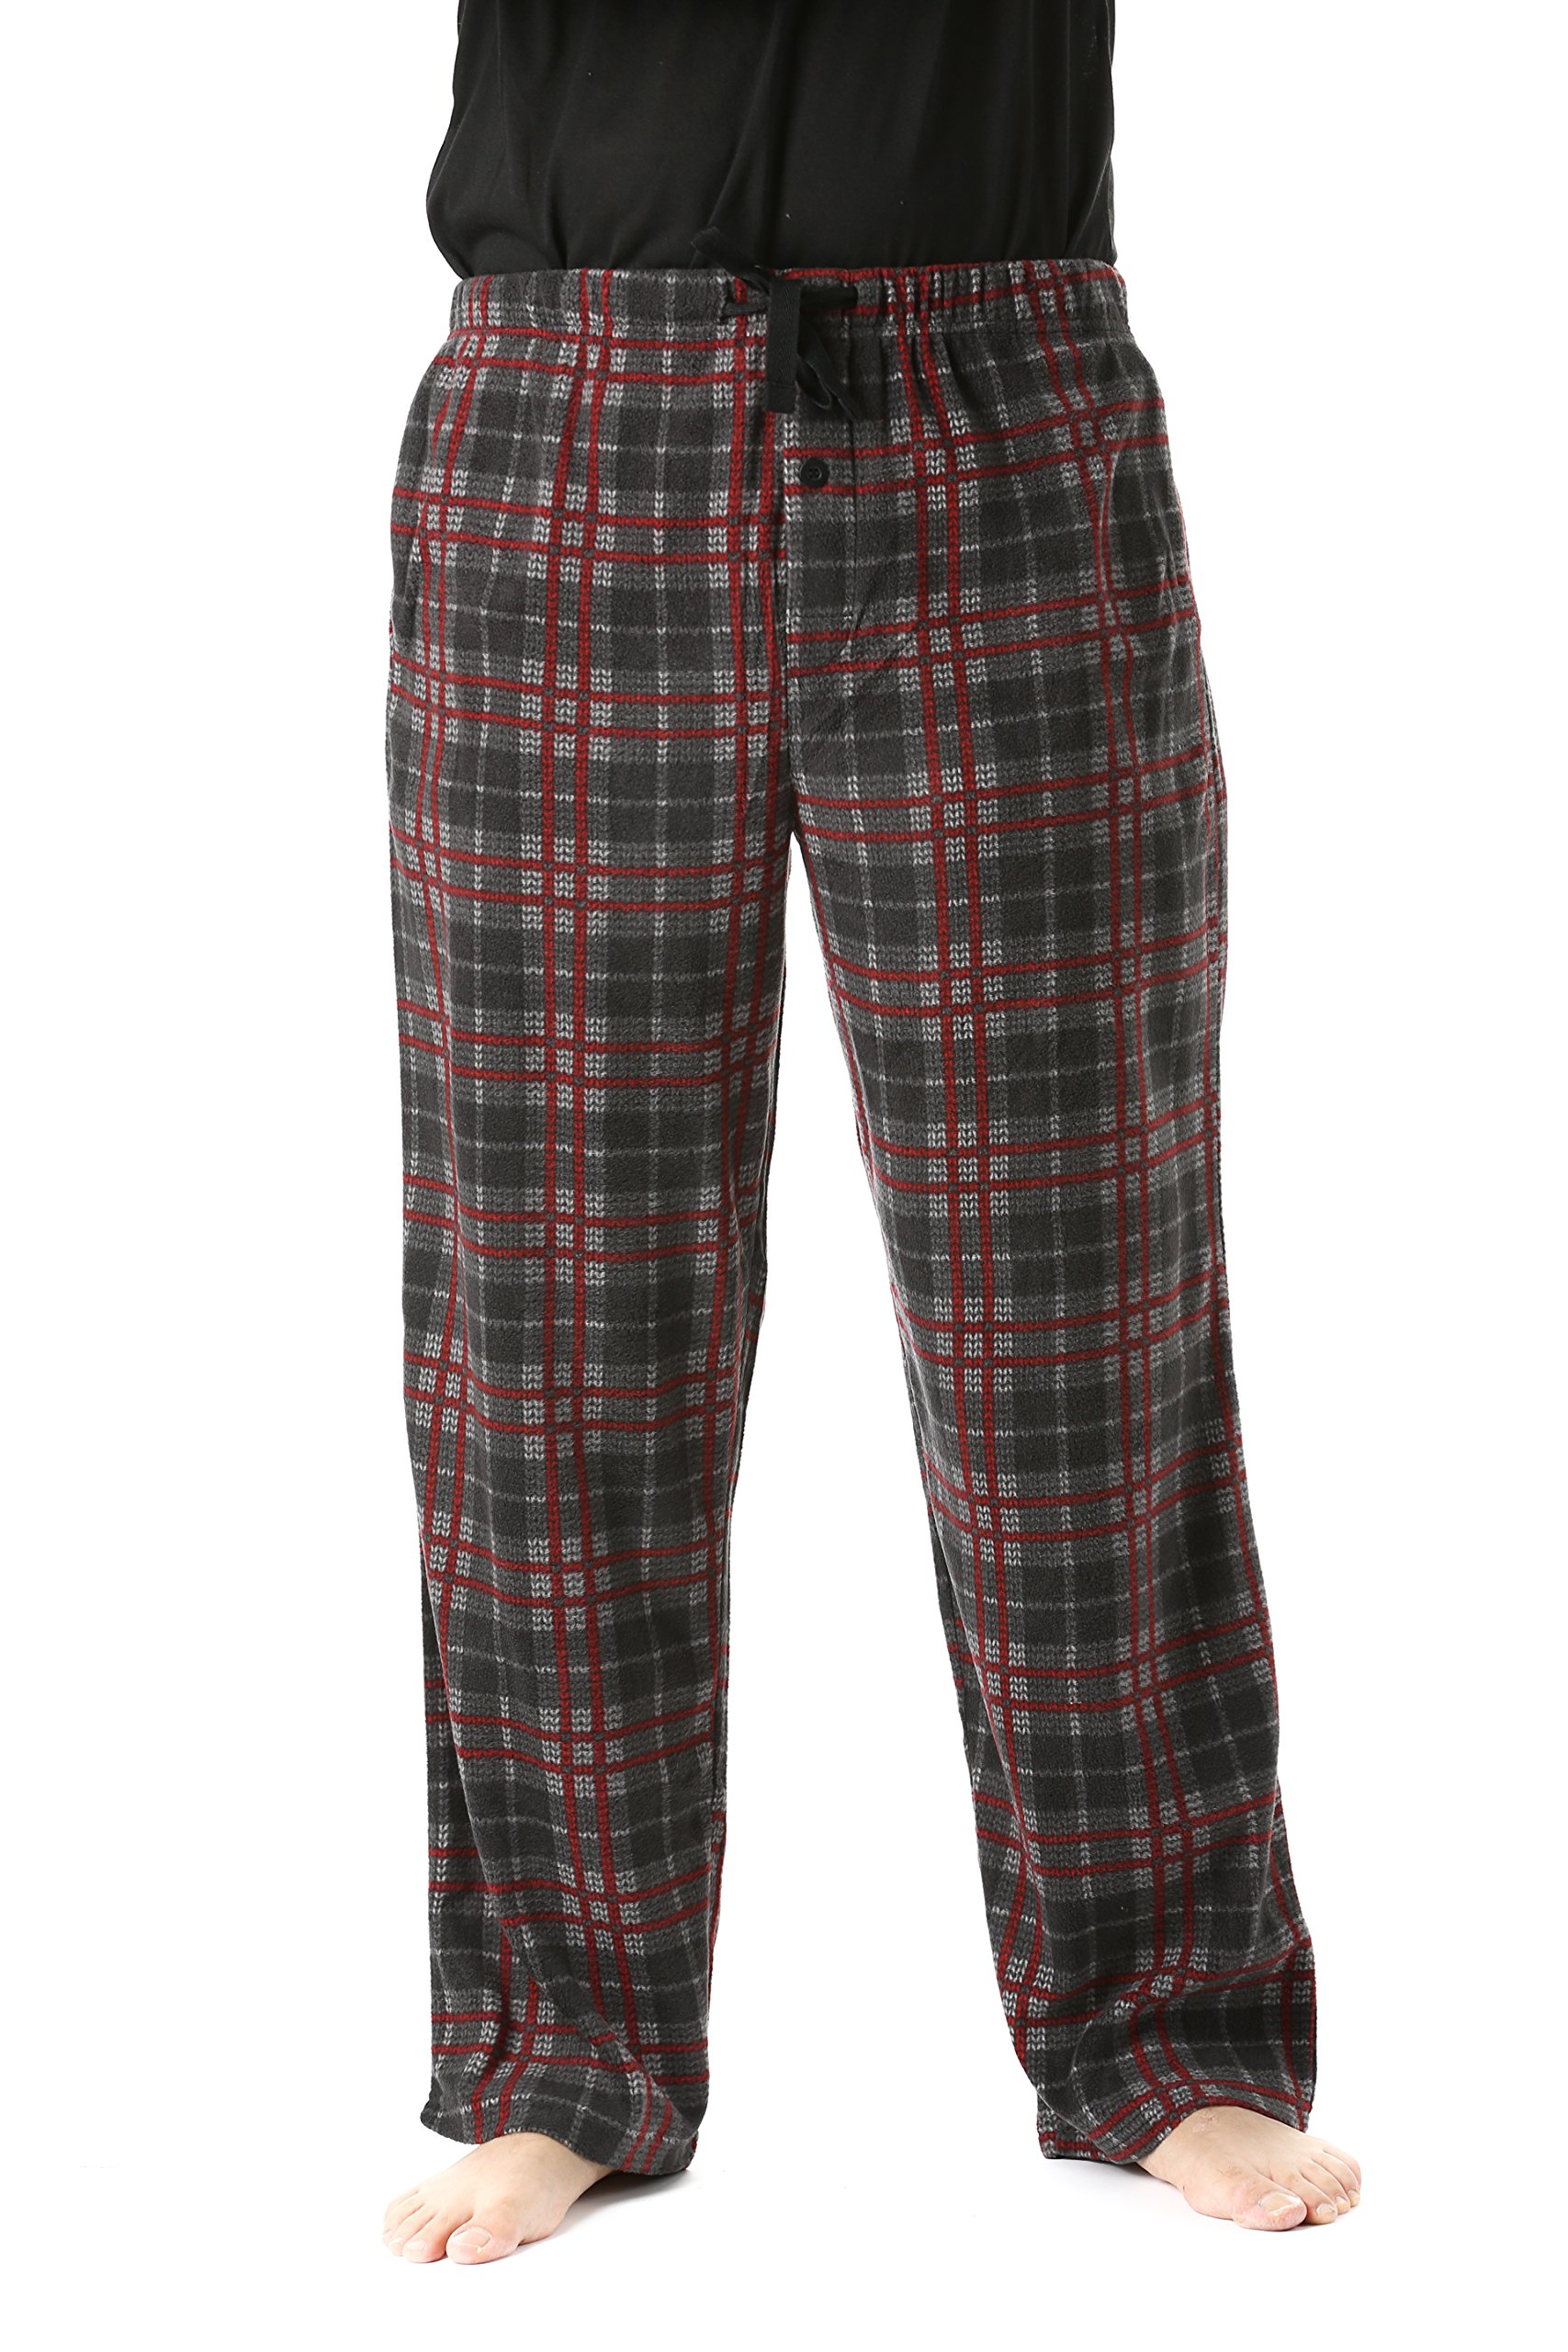 #followme 45902-13-L Polar Fleece Pajama Pants For Men Sleepwear PJS